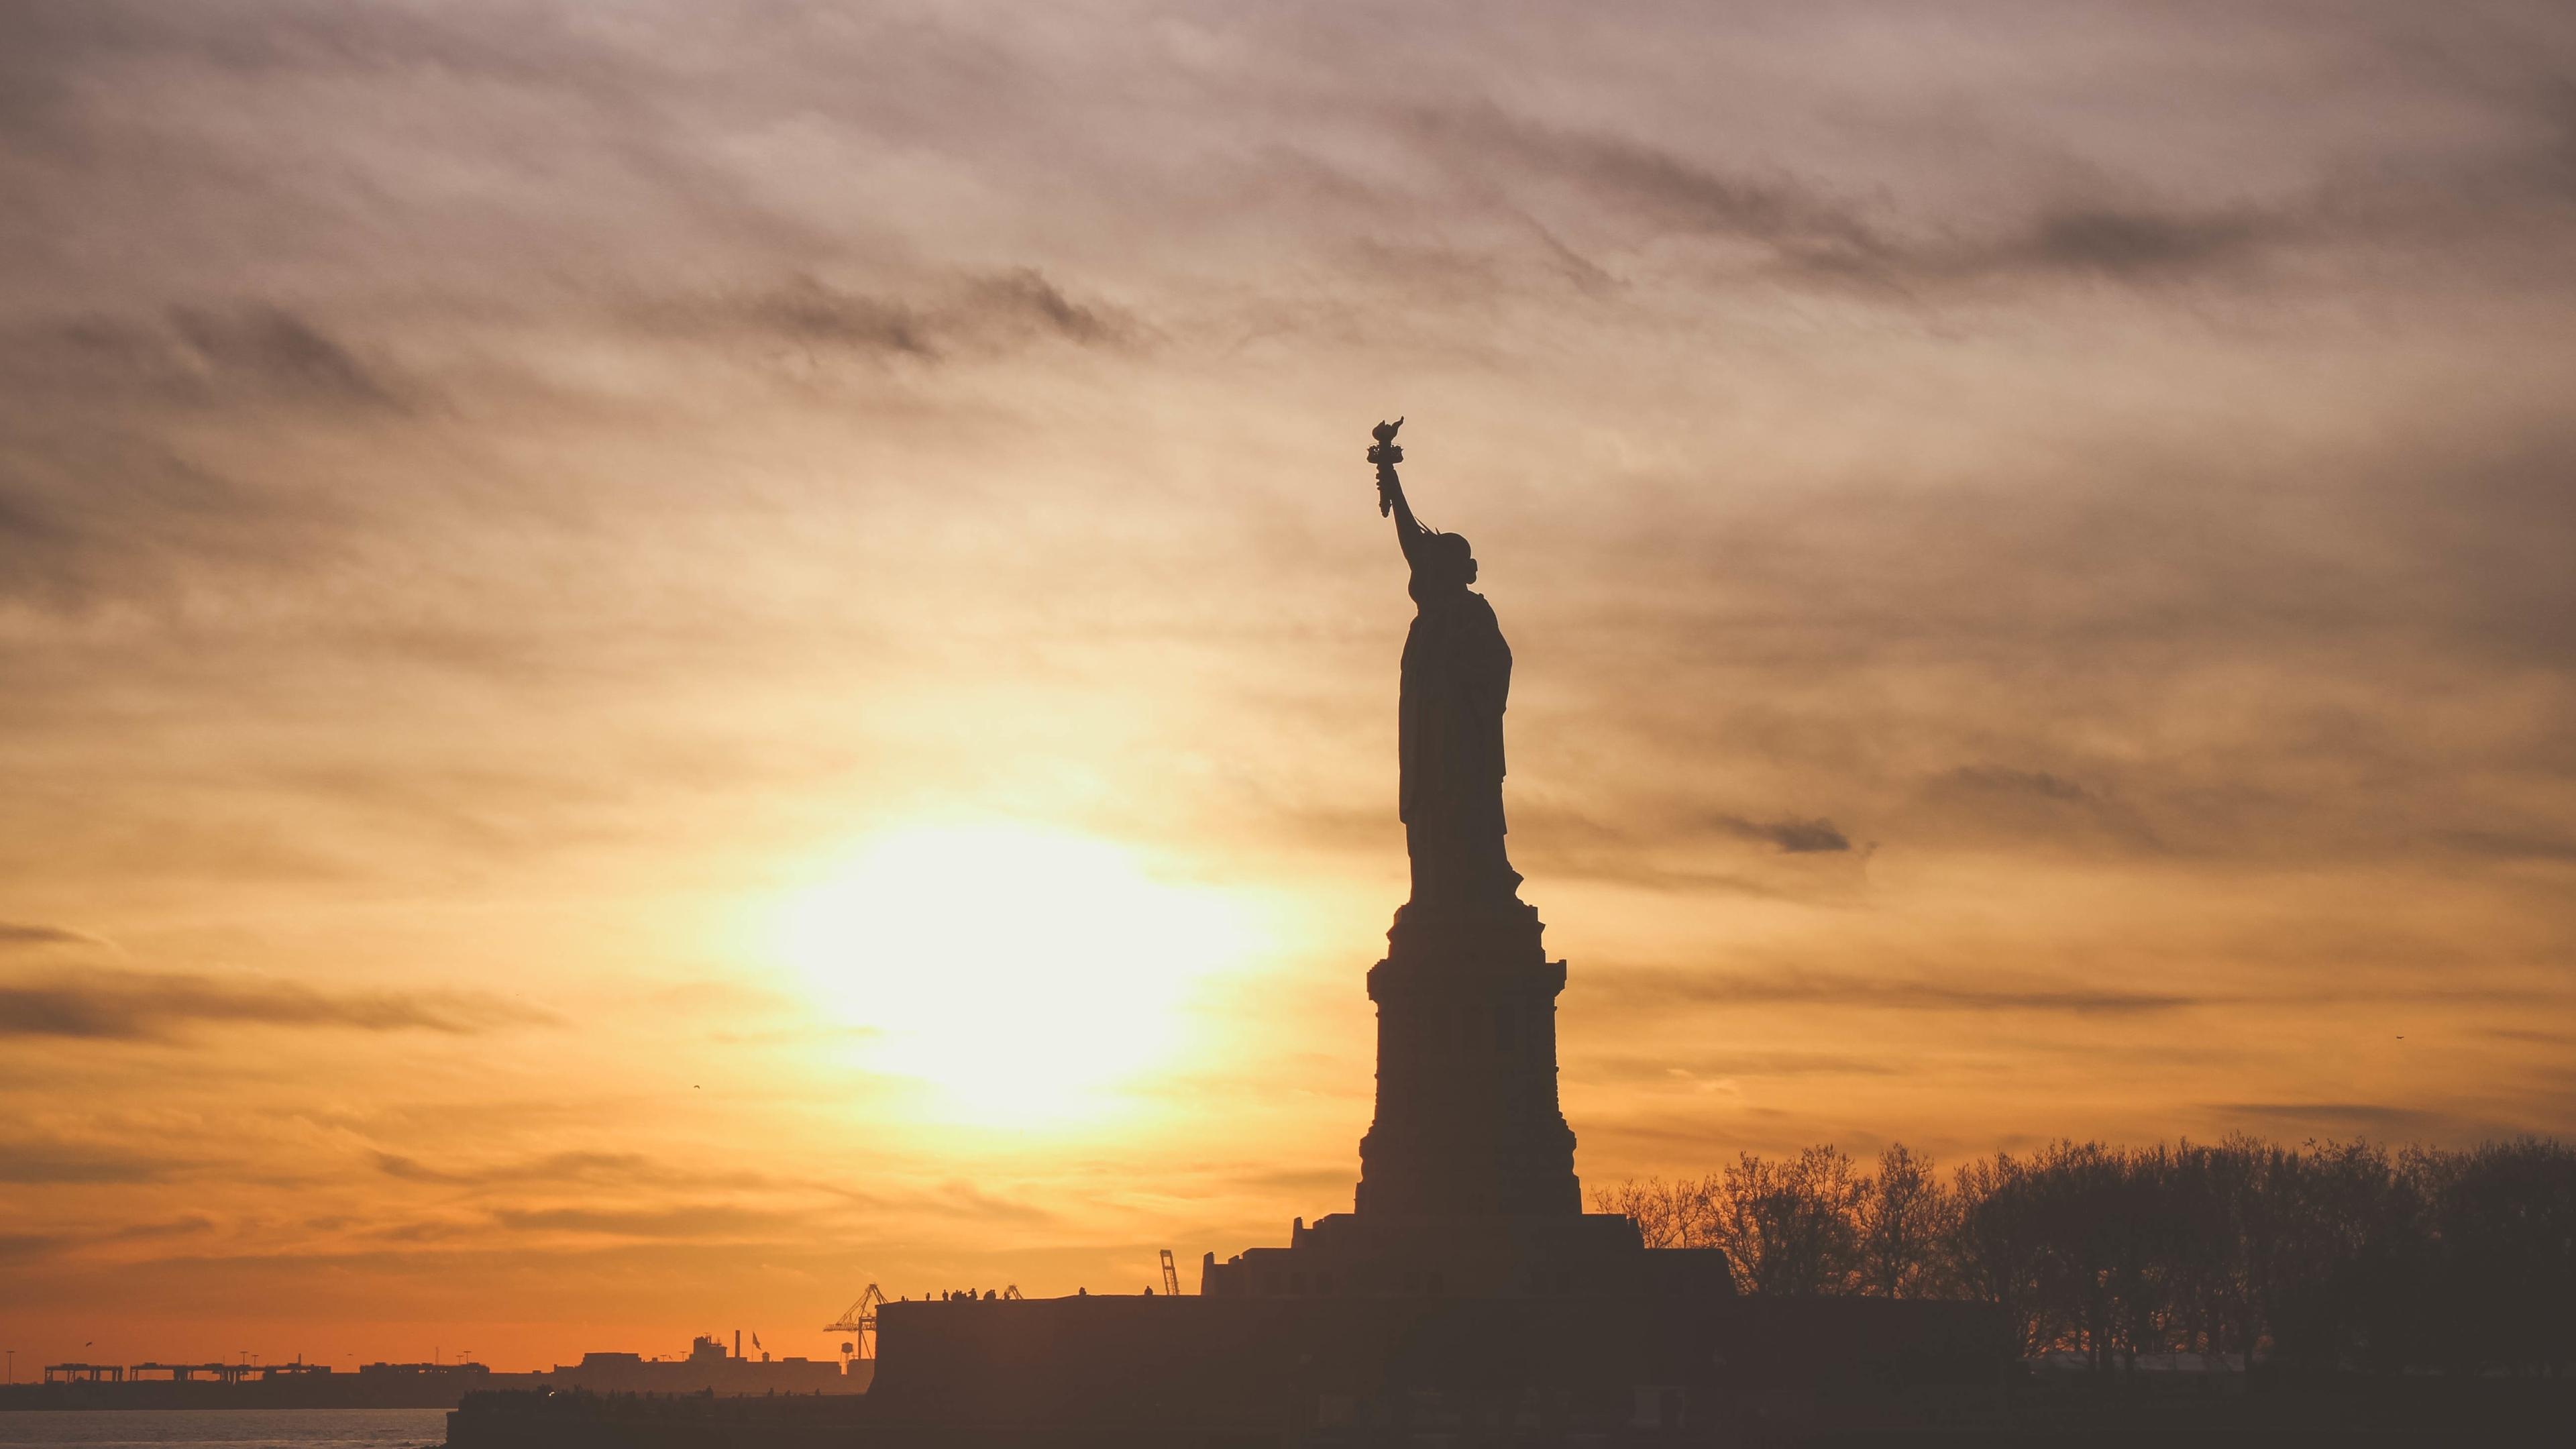 3840x2160 Statue Of Liberty Usa America 4k Wallpaper Hd